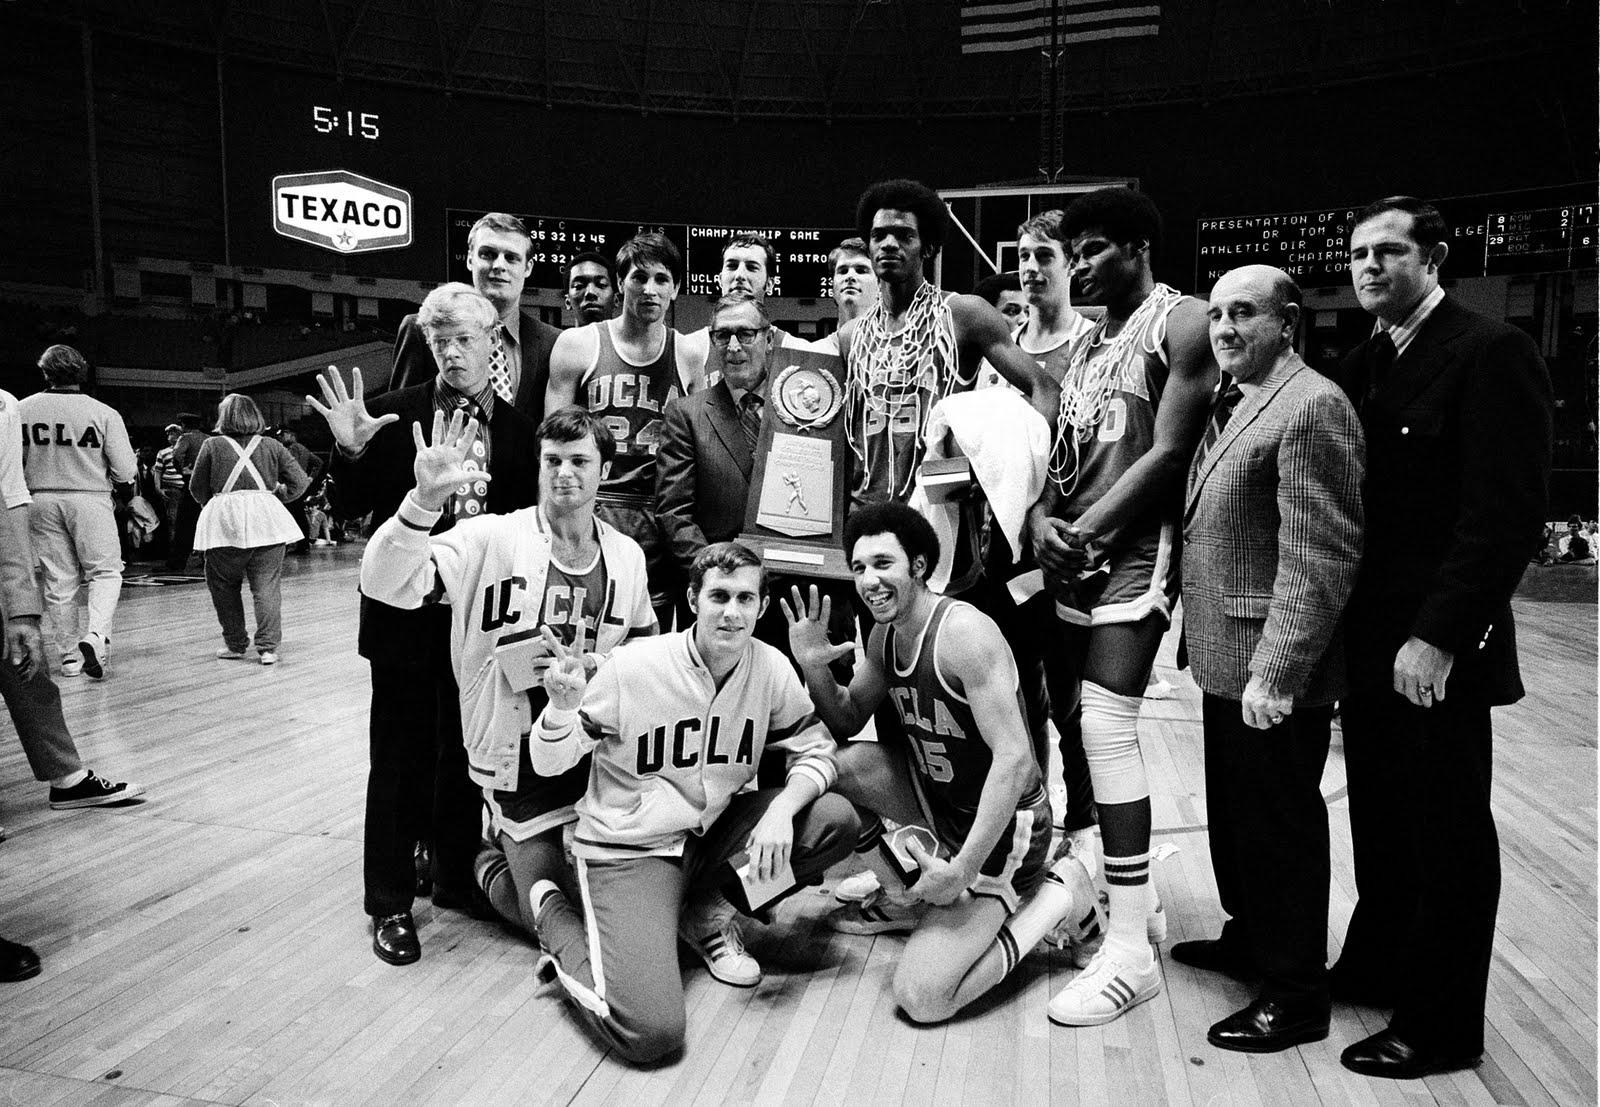 Mostly UCLA Hoops: UCLA 88-game winning streak ends